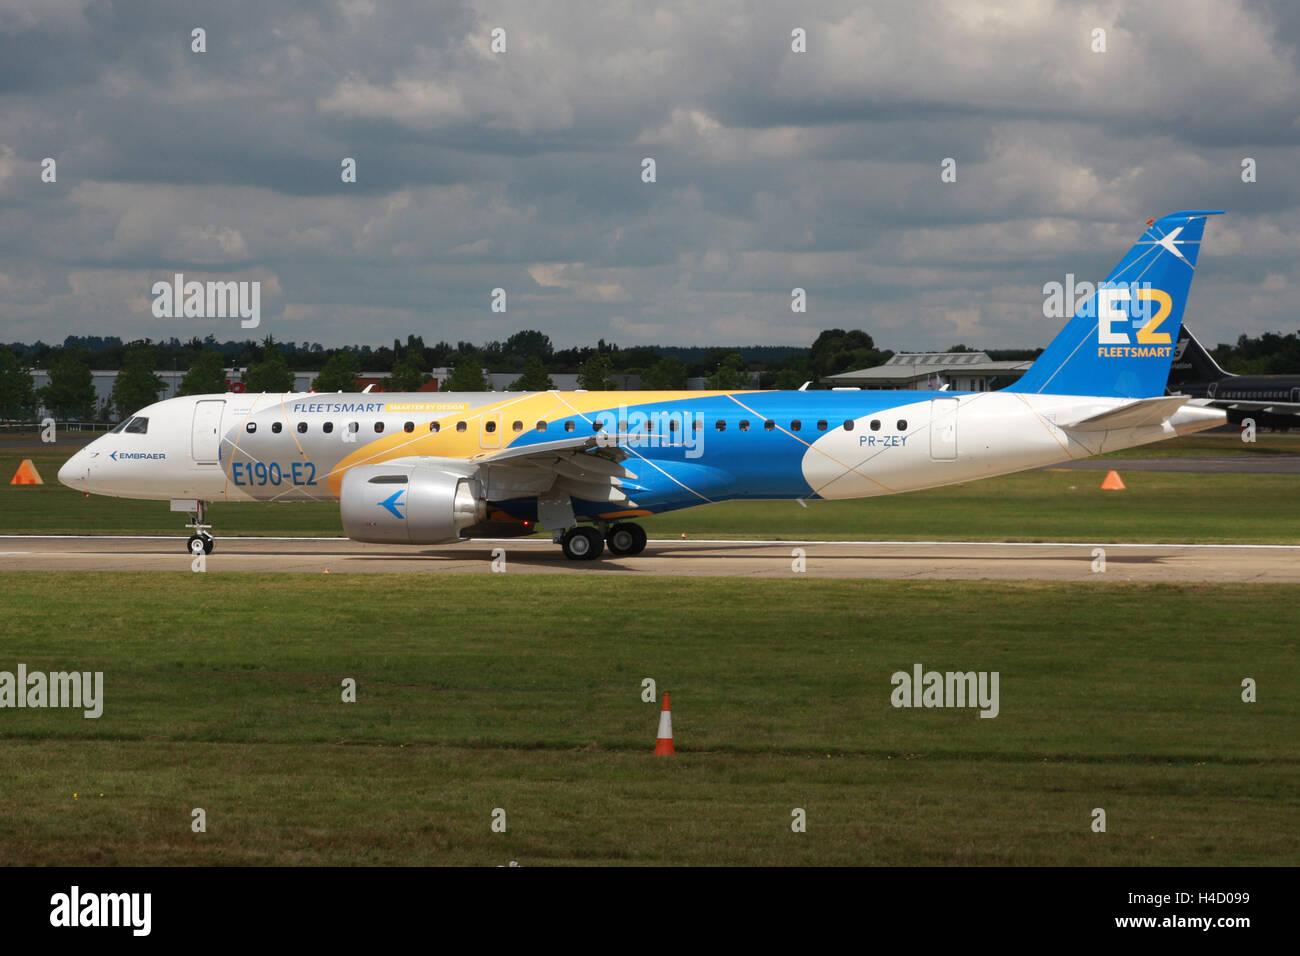 EMBRAER E190 - Stock Image